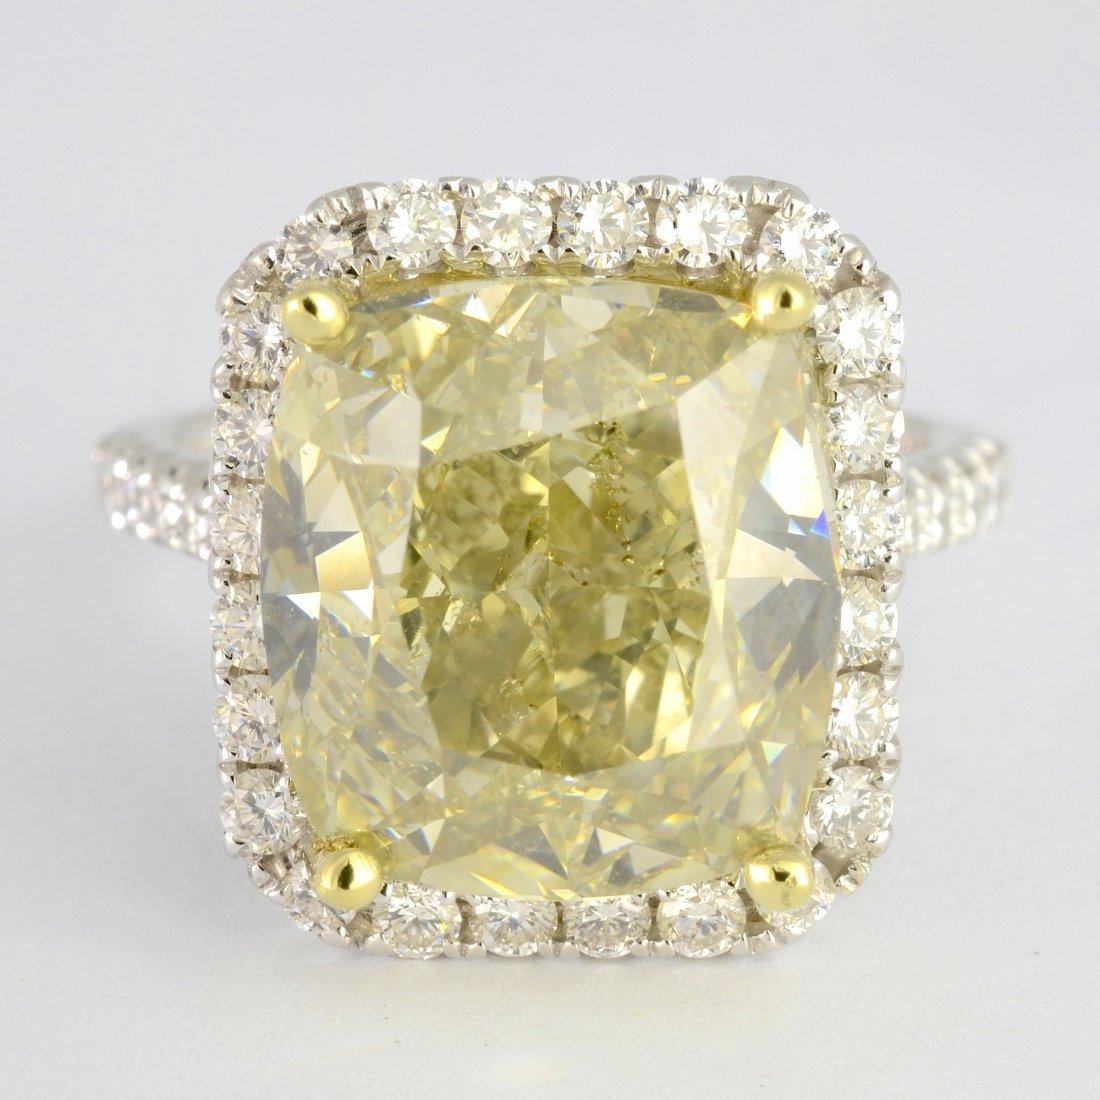 9.02 ct SI2 Clarity Diamond Ring AV: $328,615